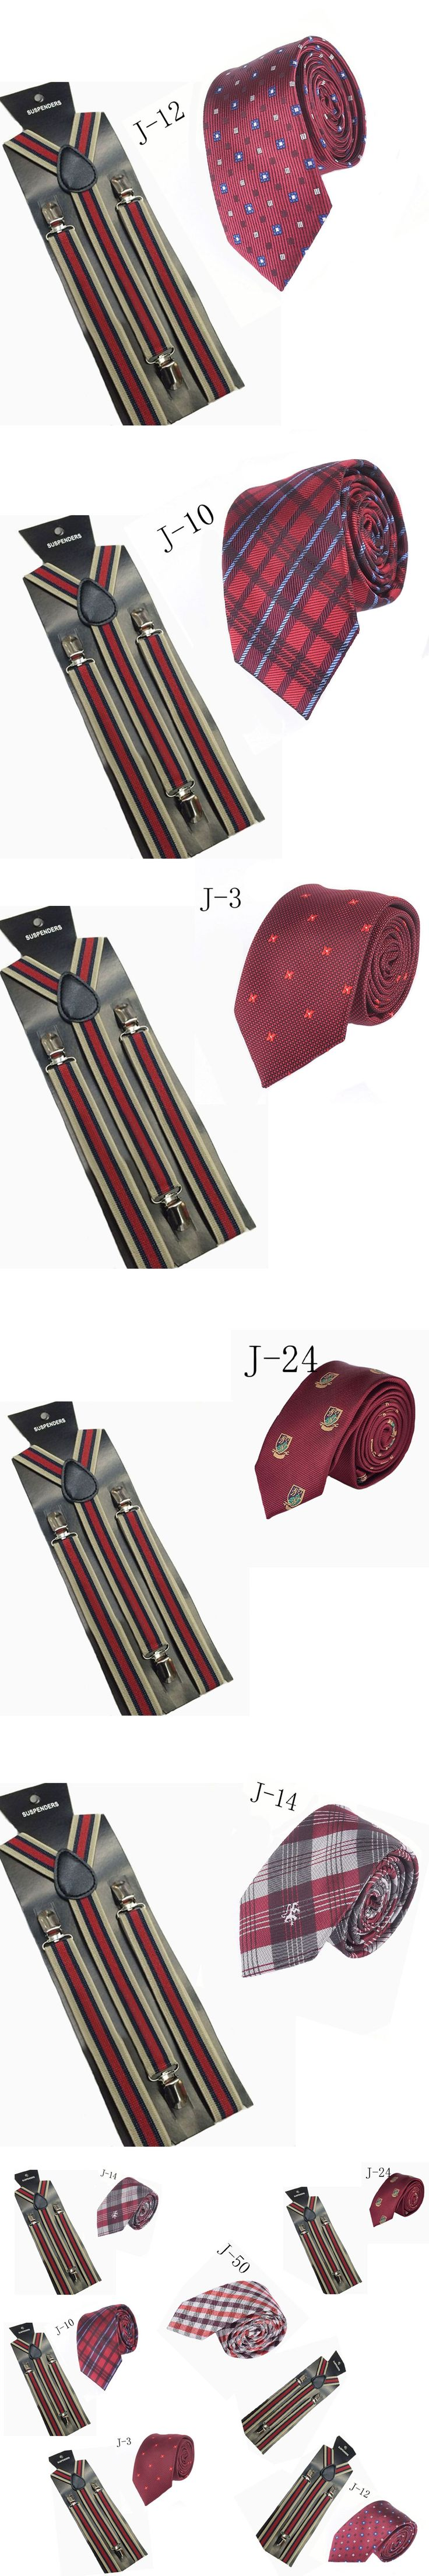 OL Men's Suits Elastic Striped Suspenders Men 3 Clip Suspenders Belt Strap Adjustable Braces Suspenders Tie Combination ZH007